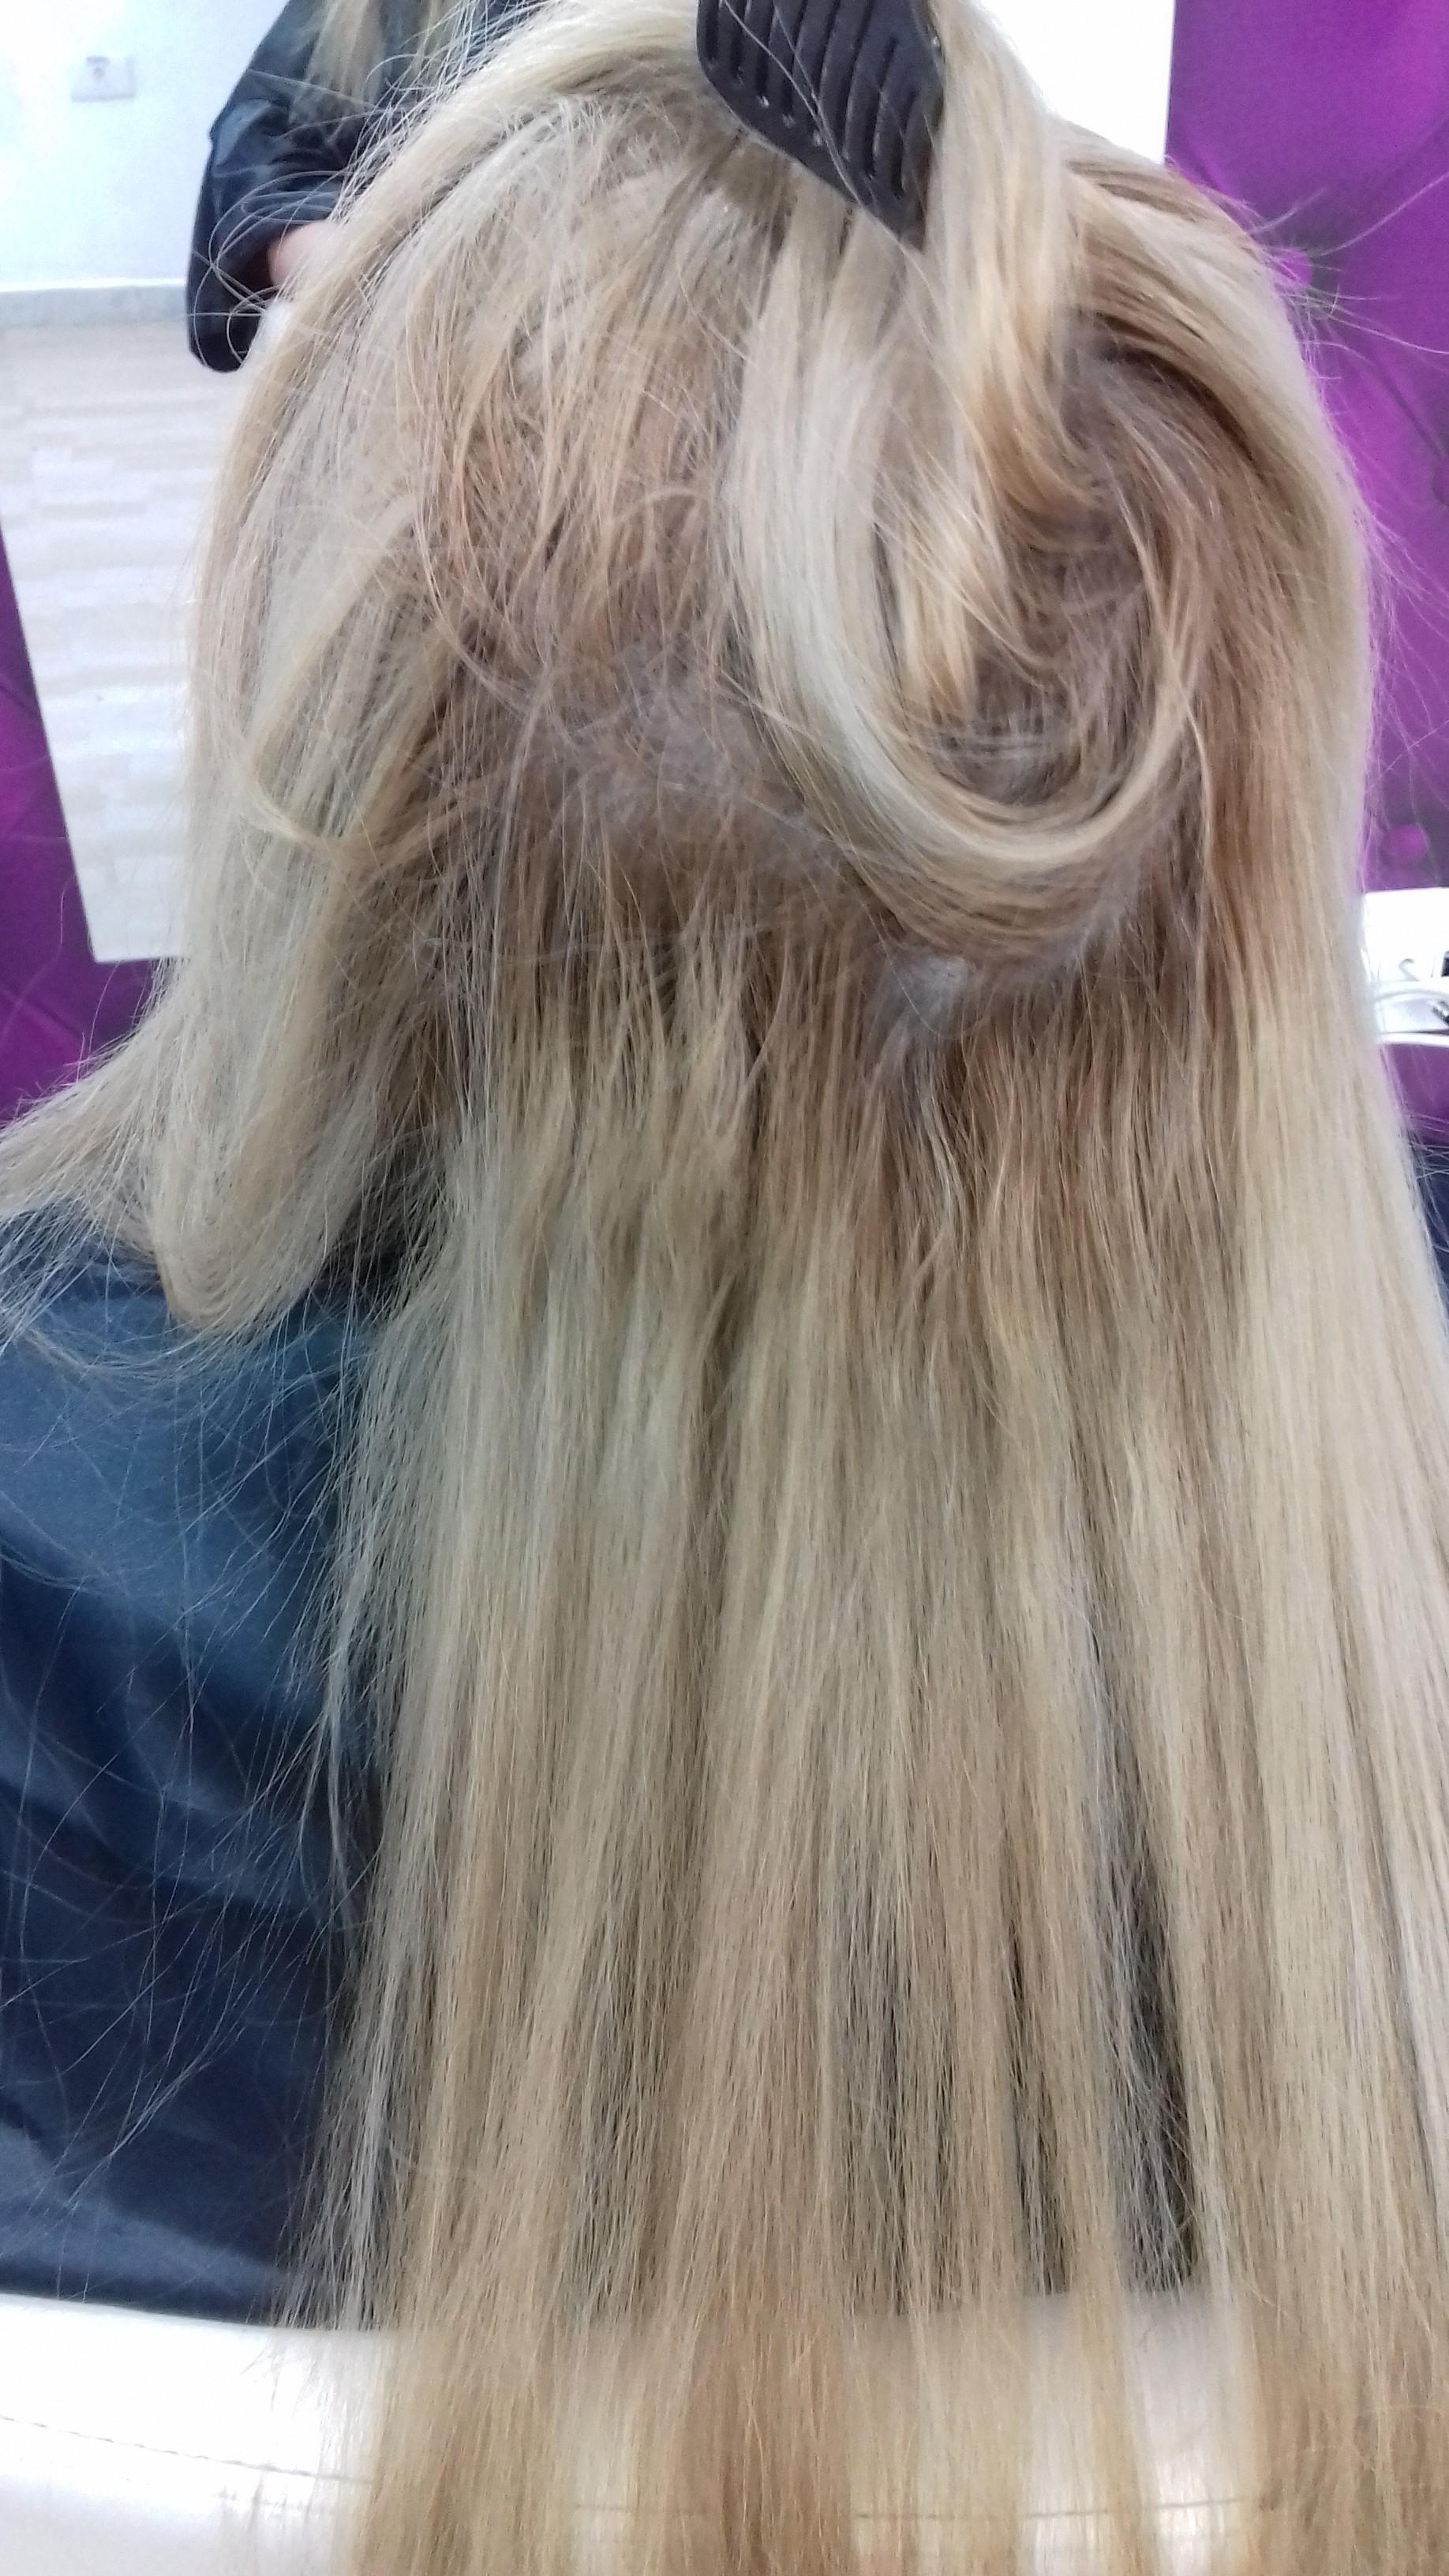 cabelo manchado cabelo cabeleireiro(a) maquiador(a)